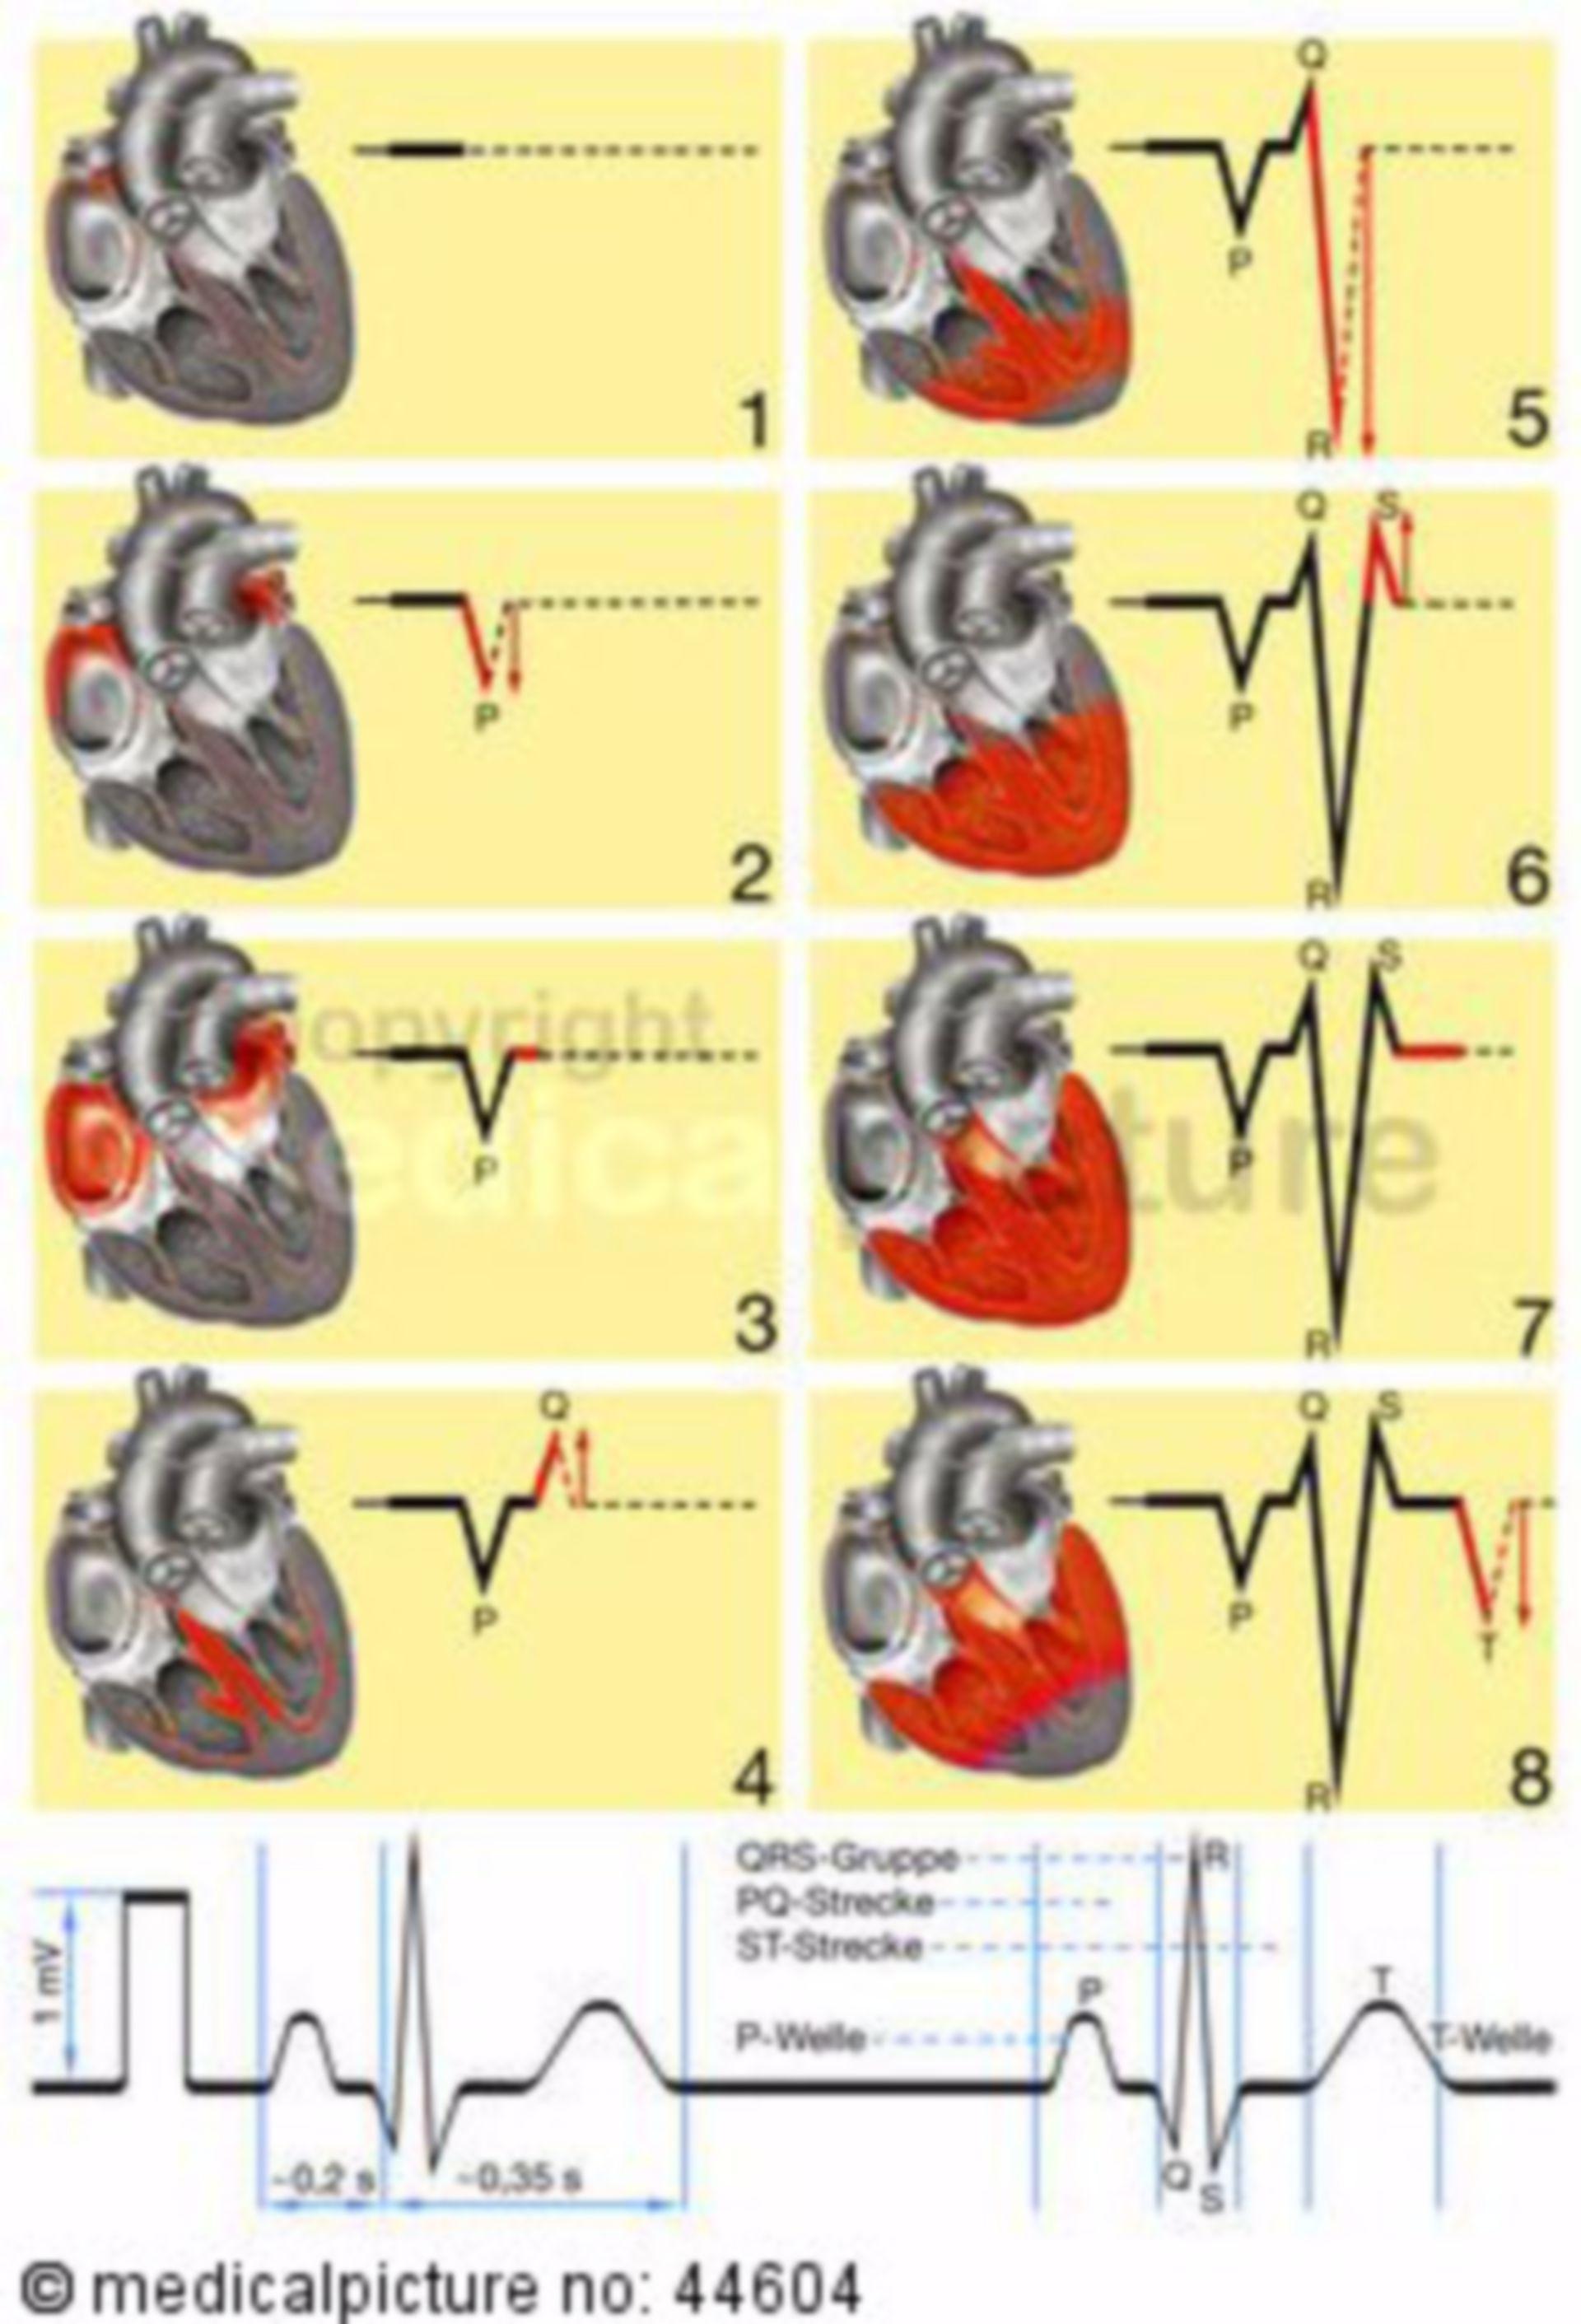 Electrophysiology of the exitation transmission